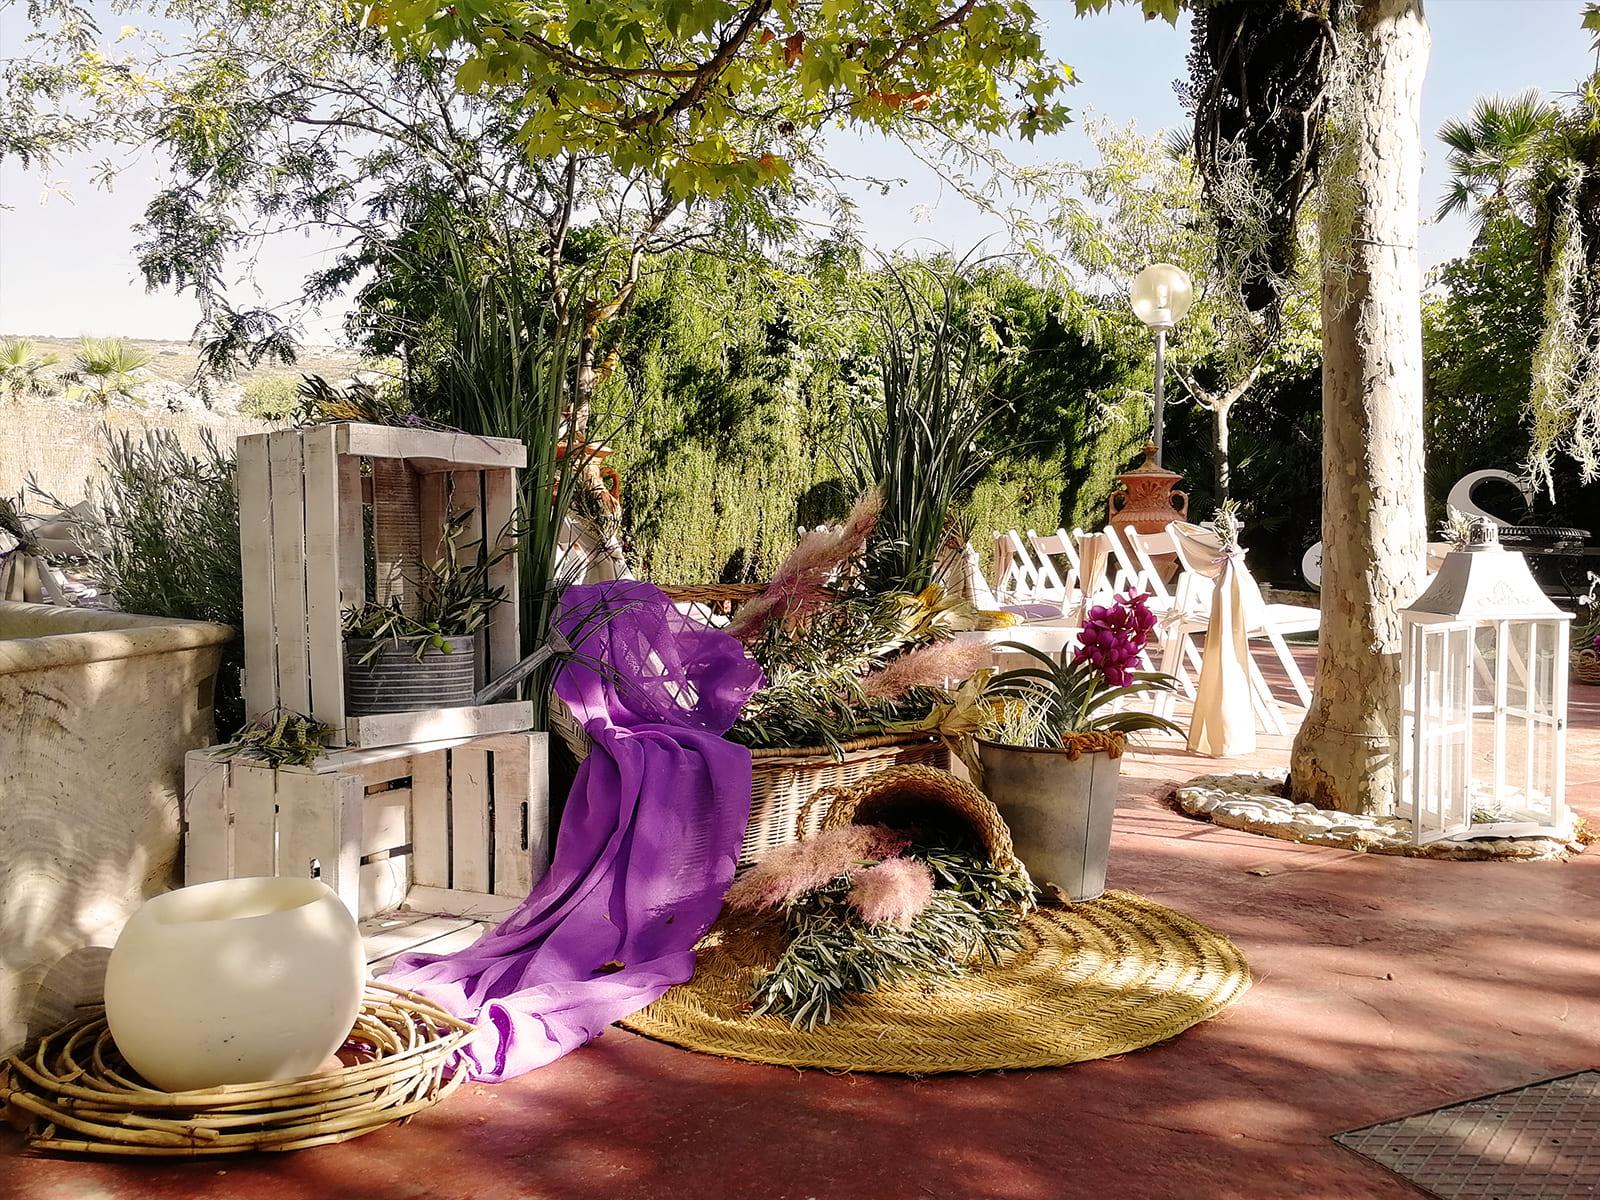 boda-civil-rupestre-personalizada-tonos-morados-SJ-03_HIDROJARDIN-Bañeres